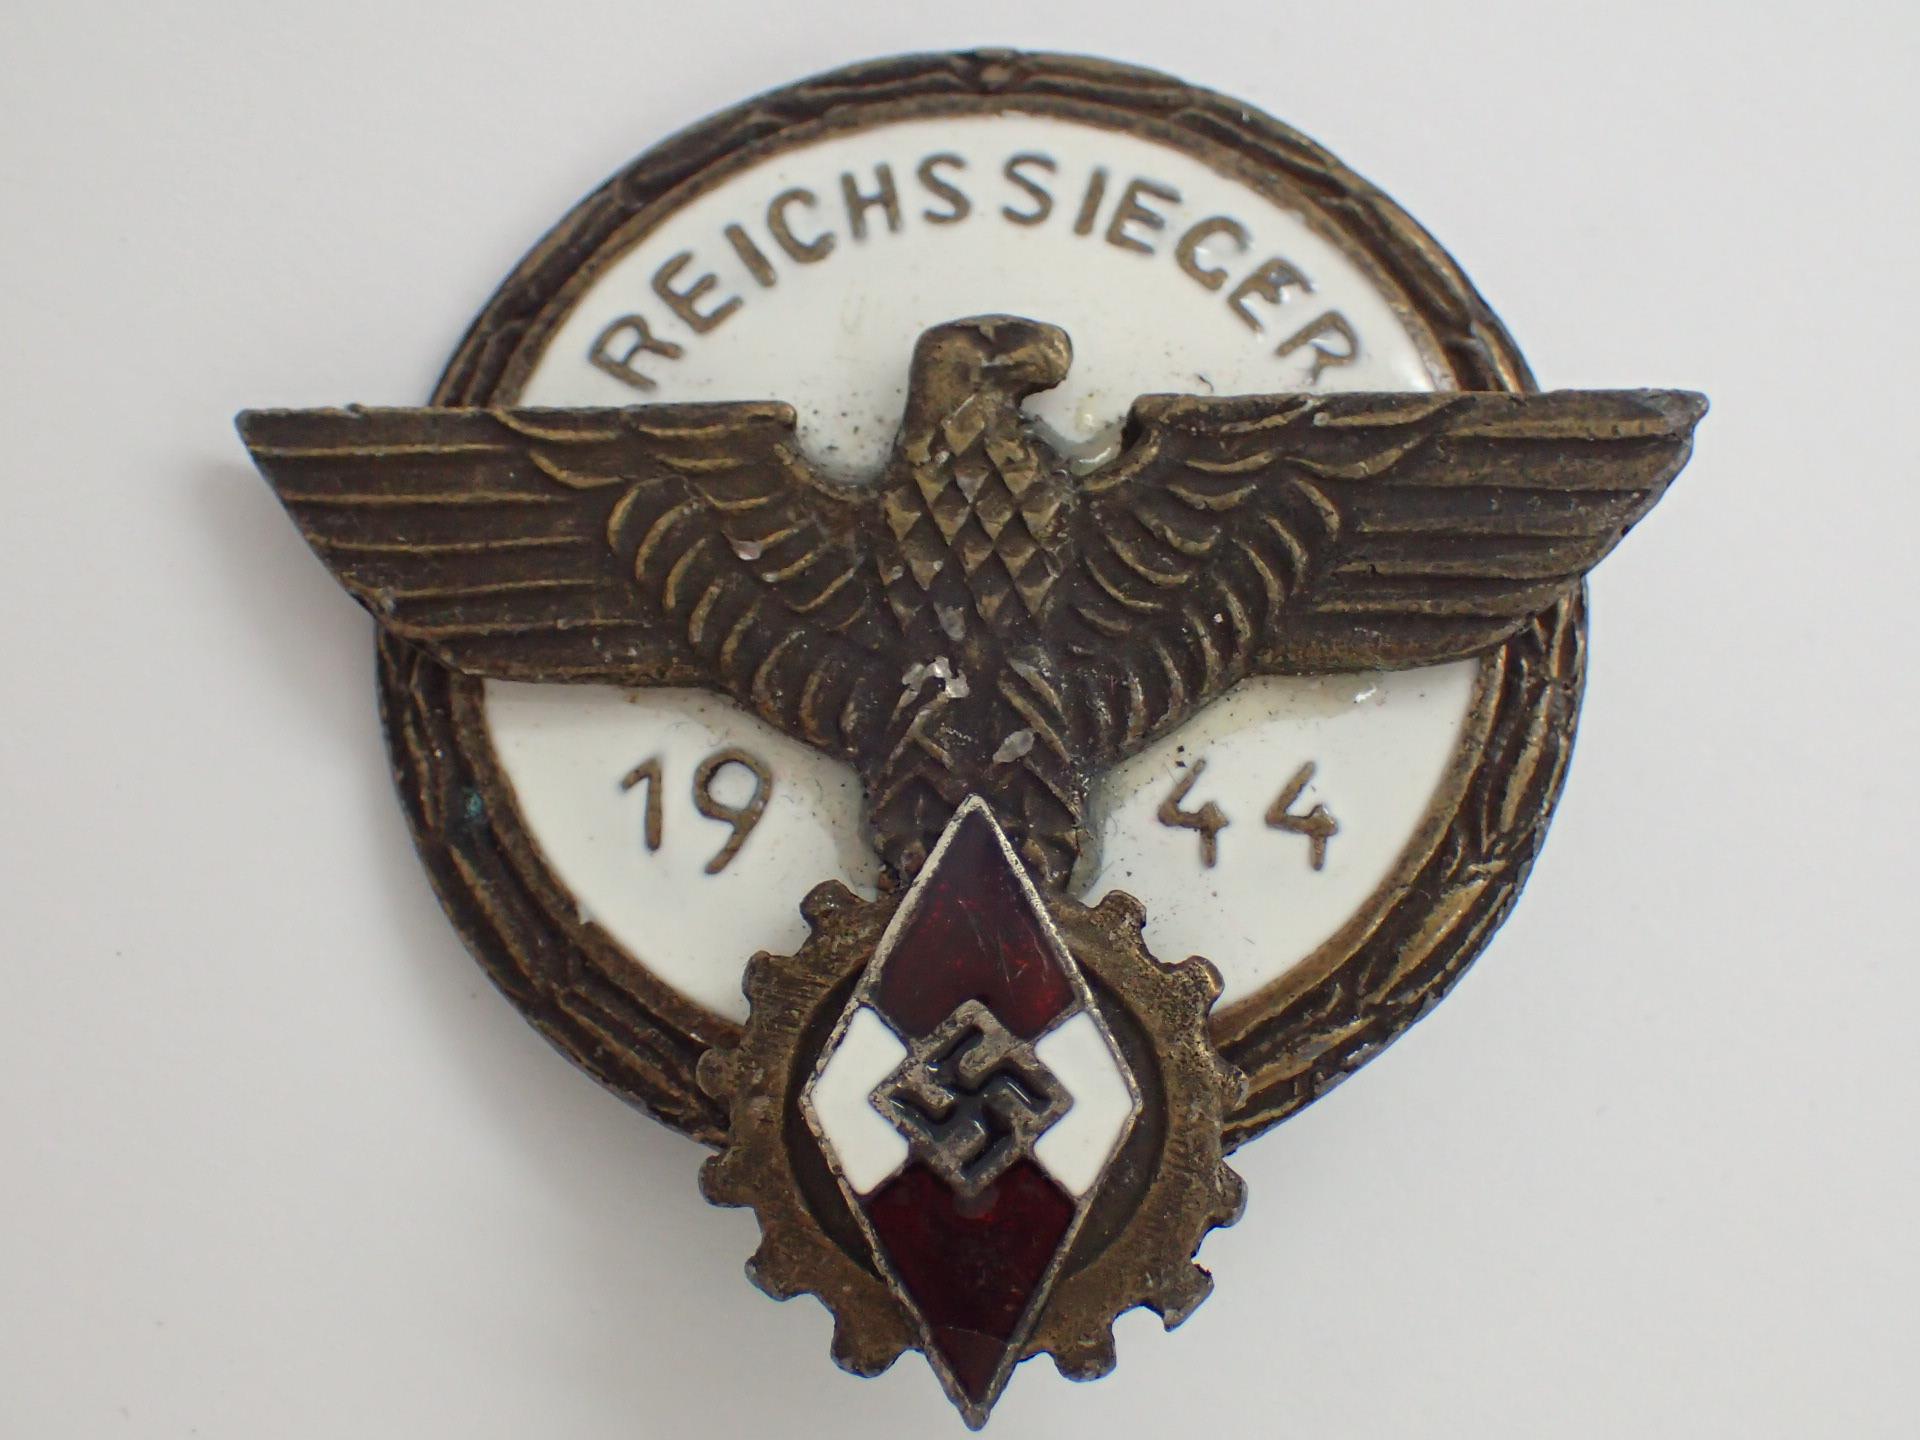 Lot 60 - WWII German Reichs Sieger 1944 Hitler Yo